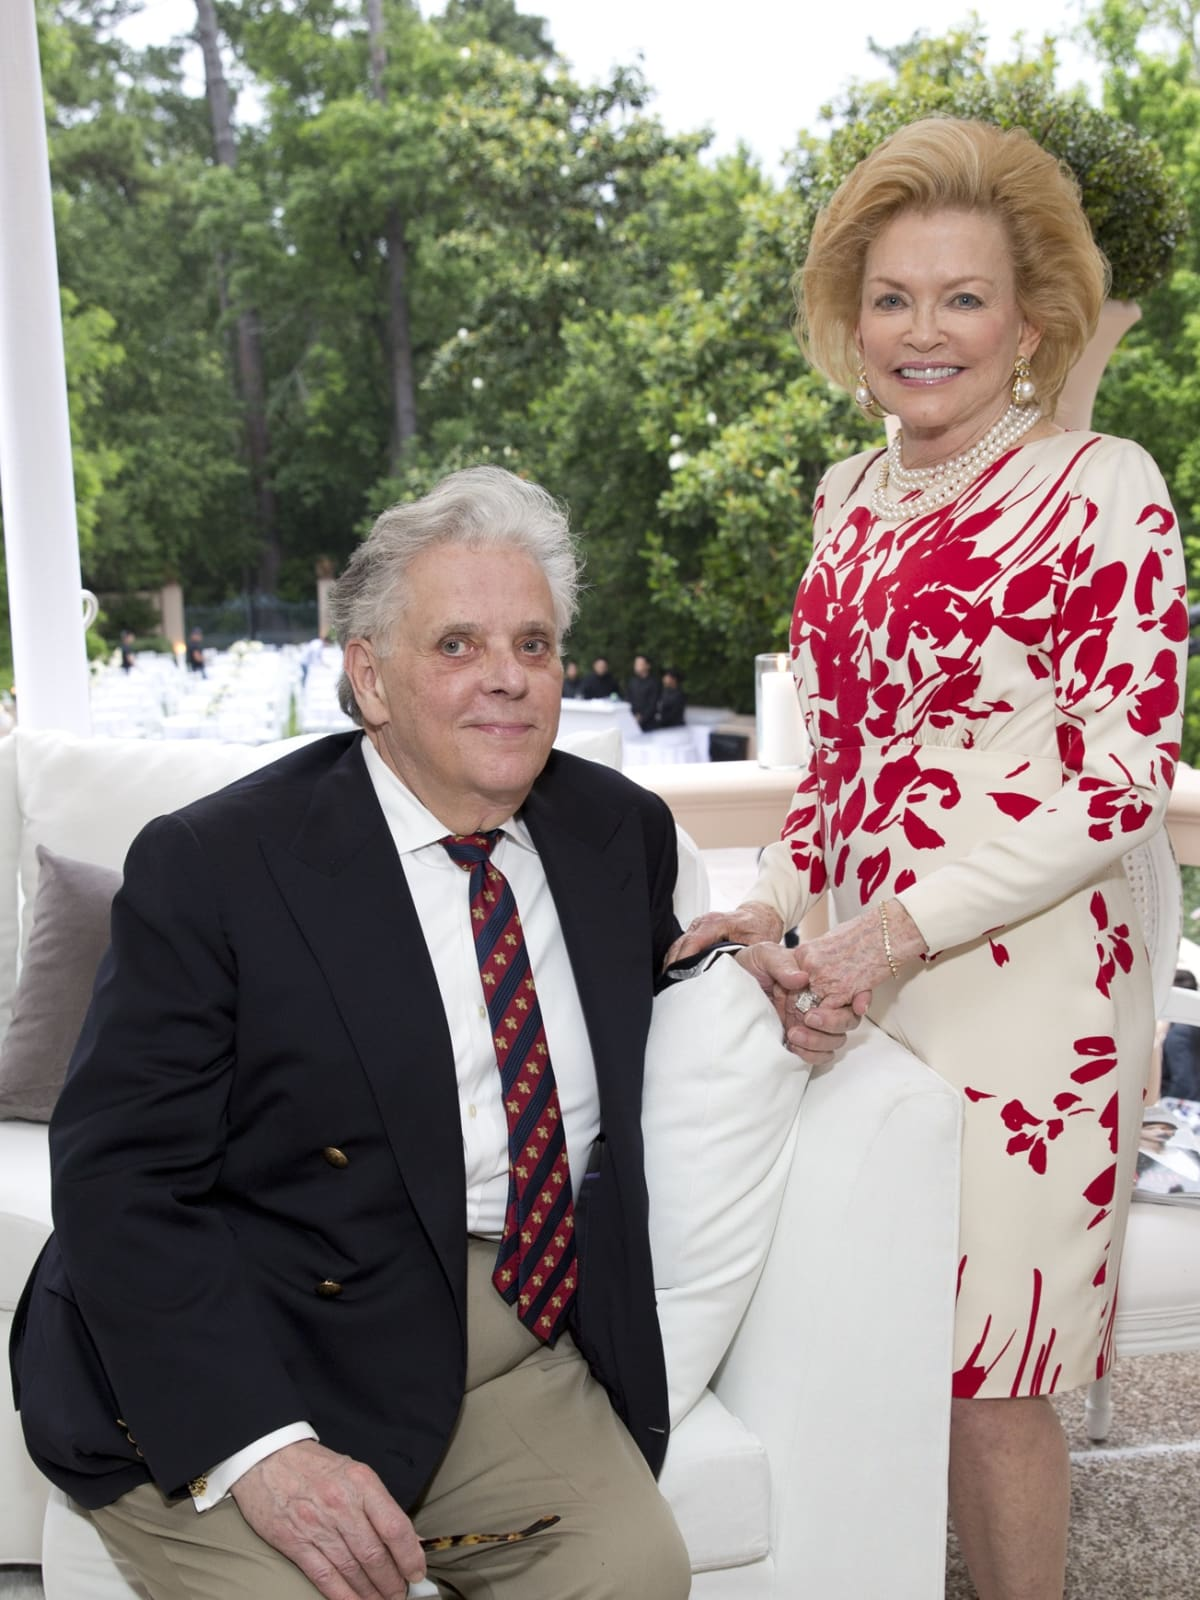 Rienzi Spring Party, 5/16  Victor Costa, Jerry Ann Woodfin-Costa